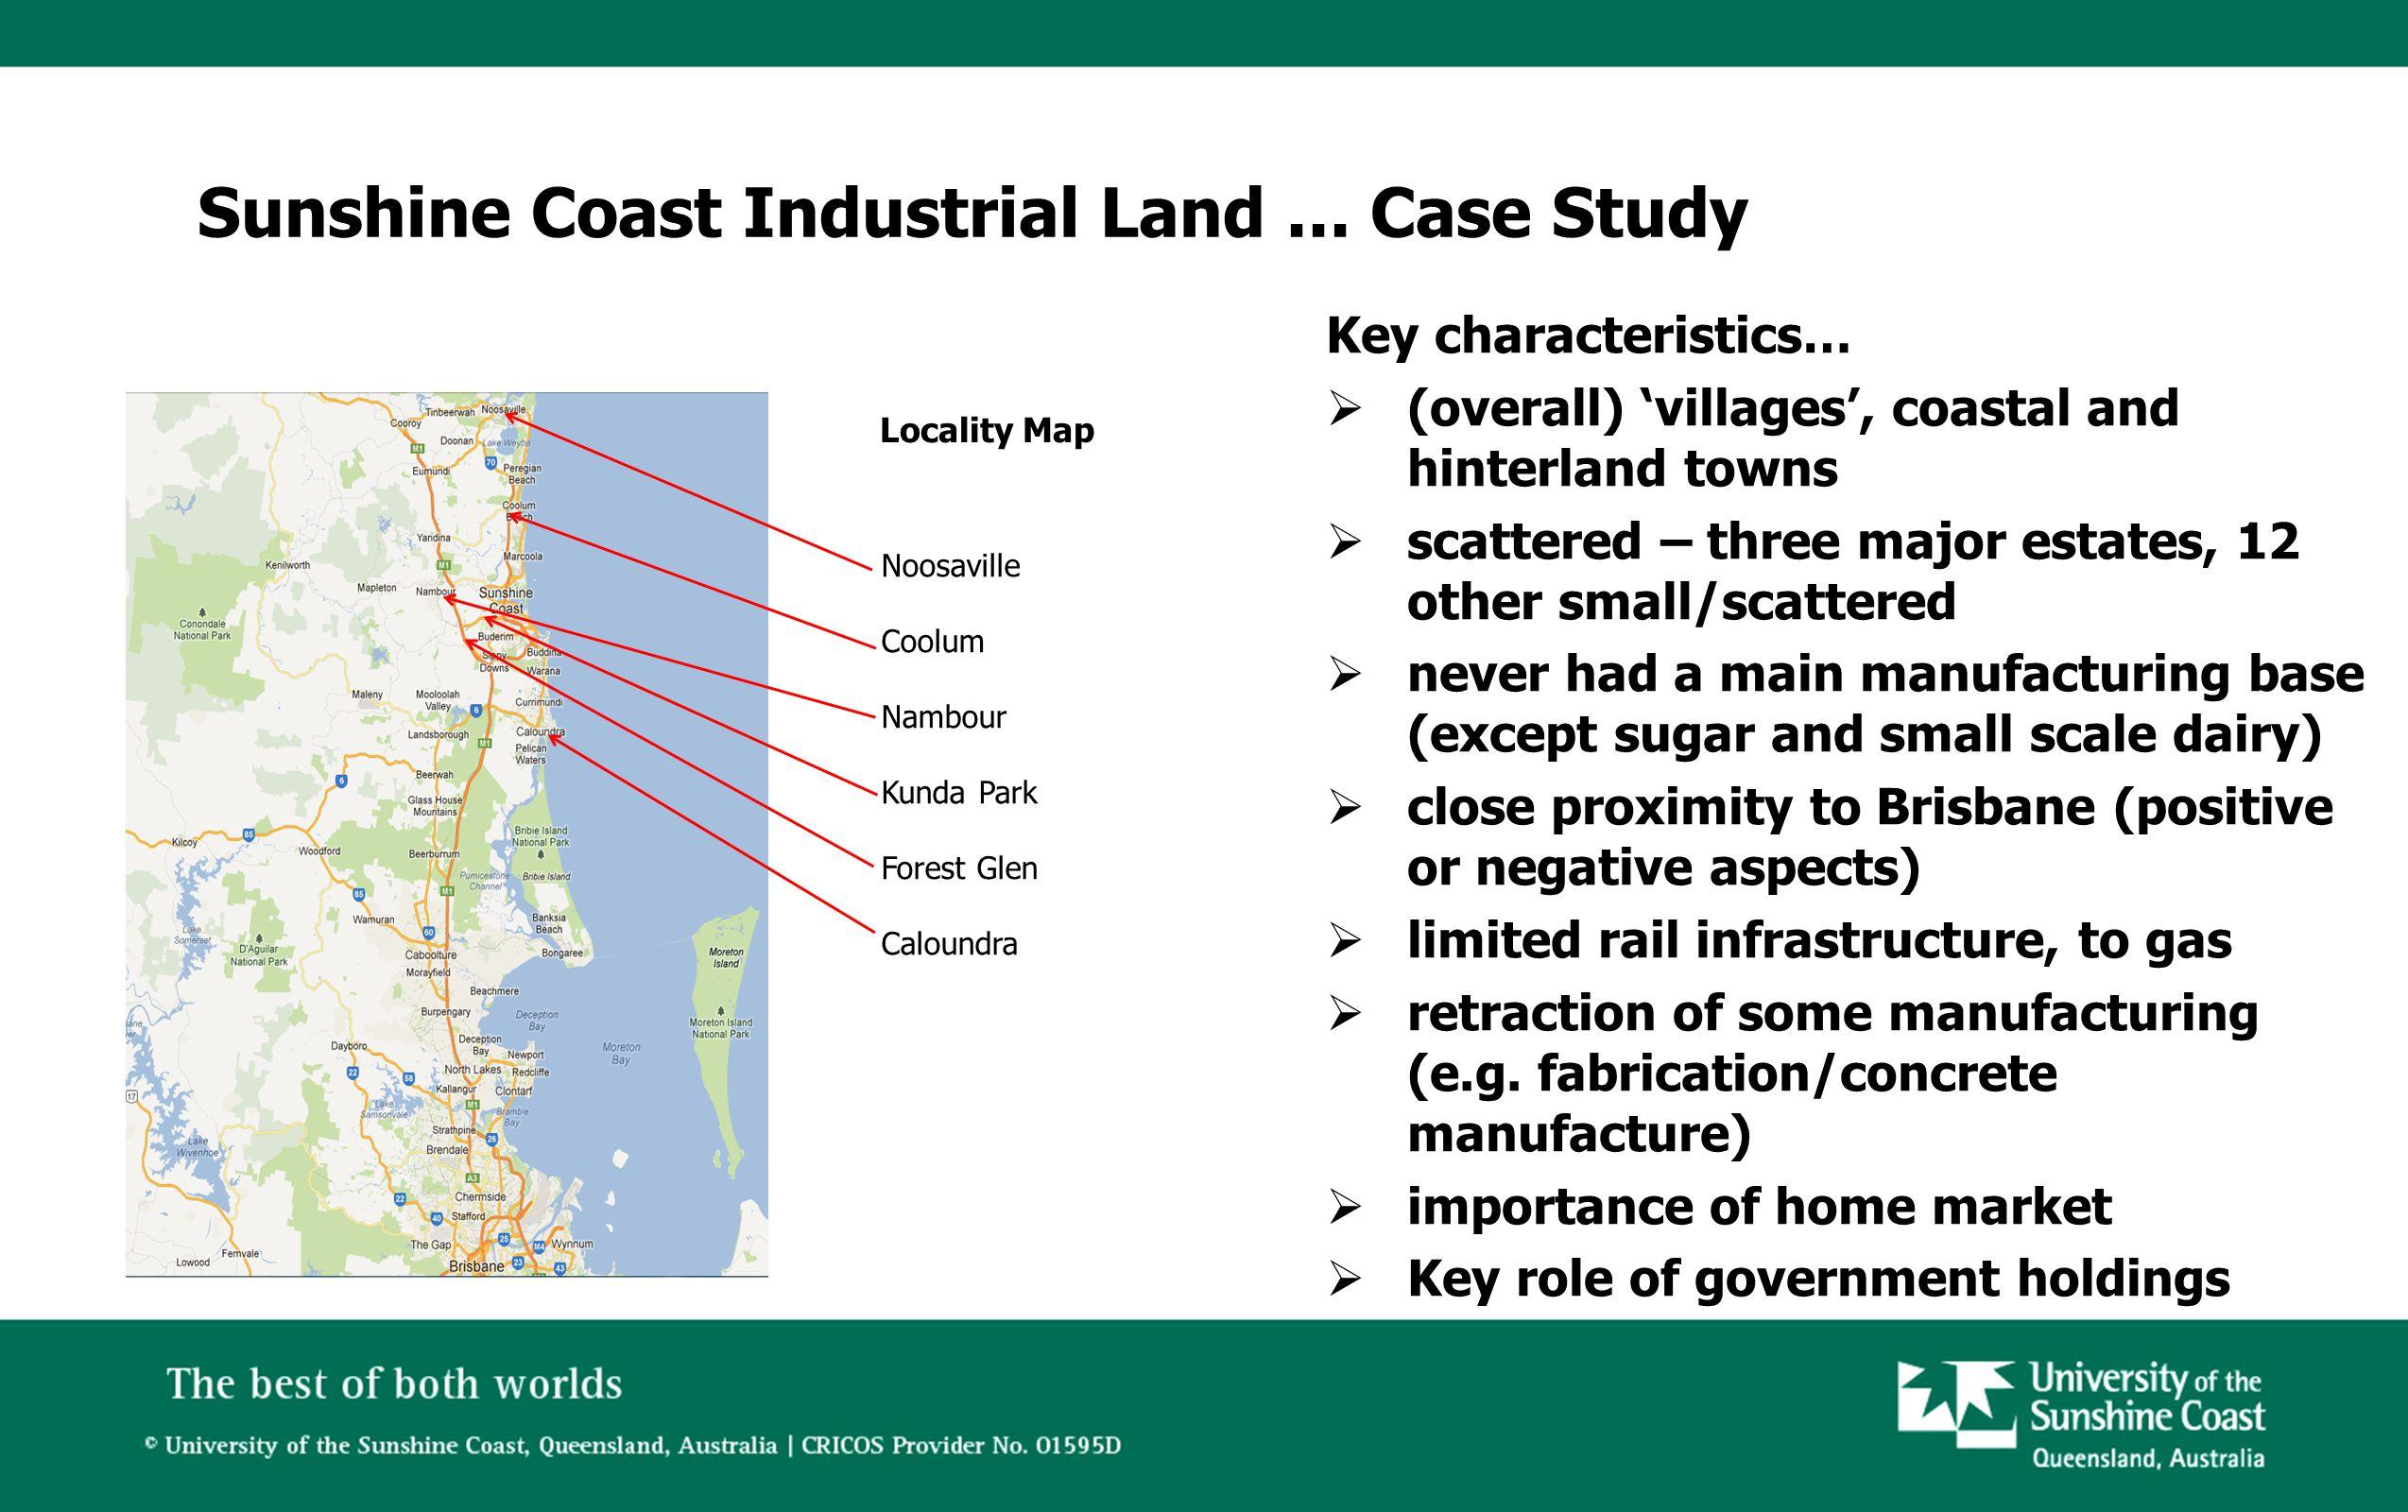 Ref: maps.google.com.au Sunshine Coast Industrial Land...